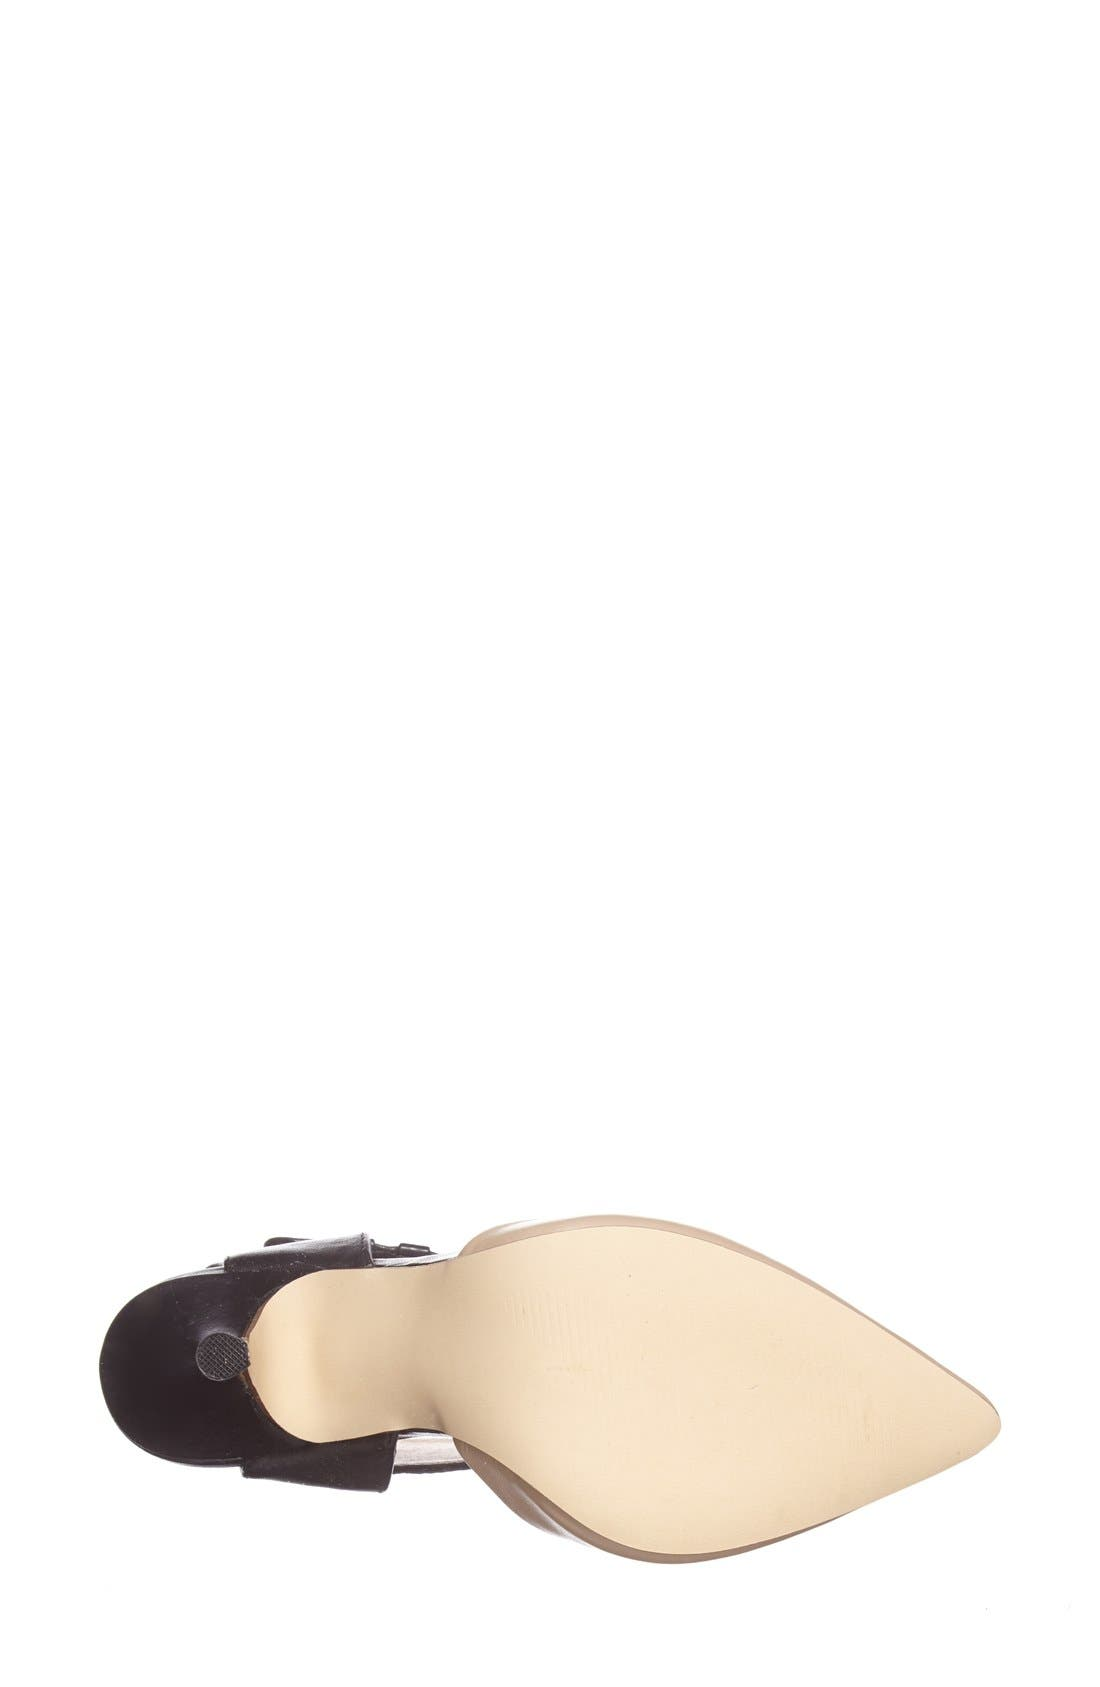 Alternate Image 4  - Steve Madden 'Swift' Pointy Toe Pump (Women)